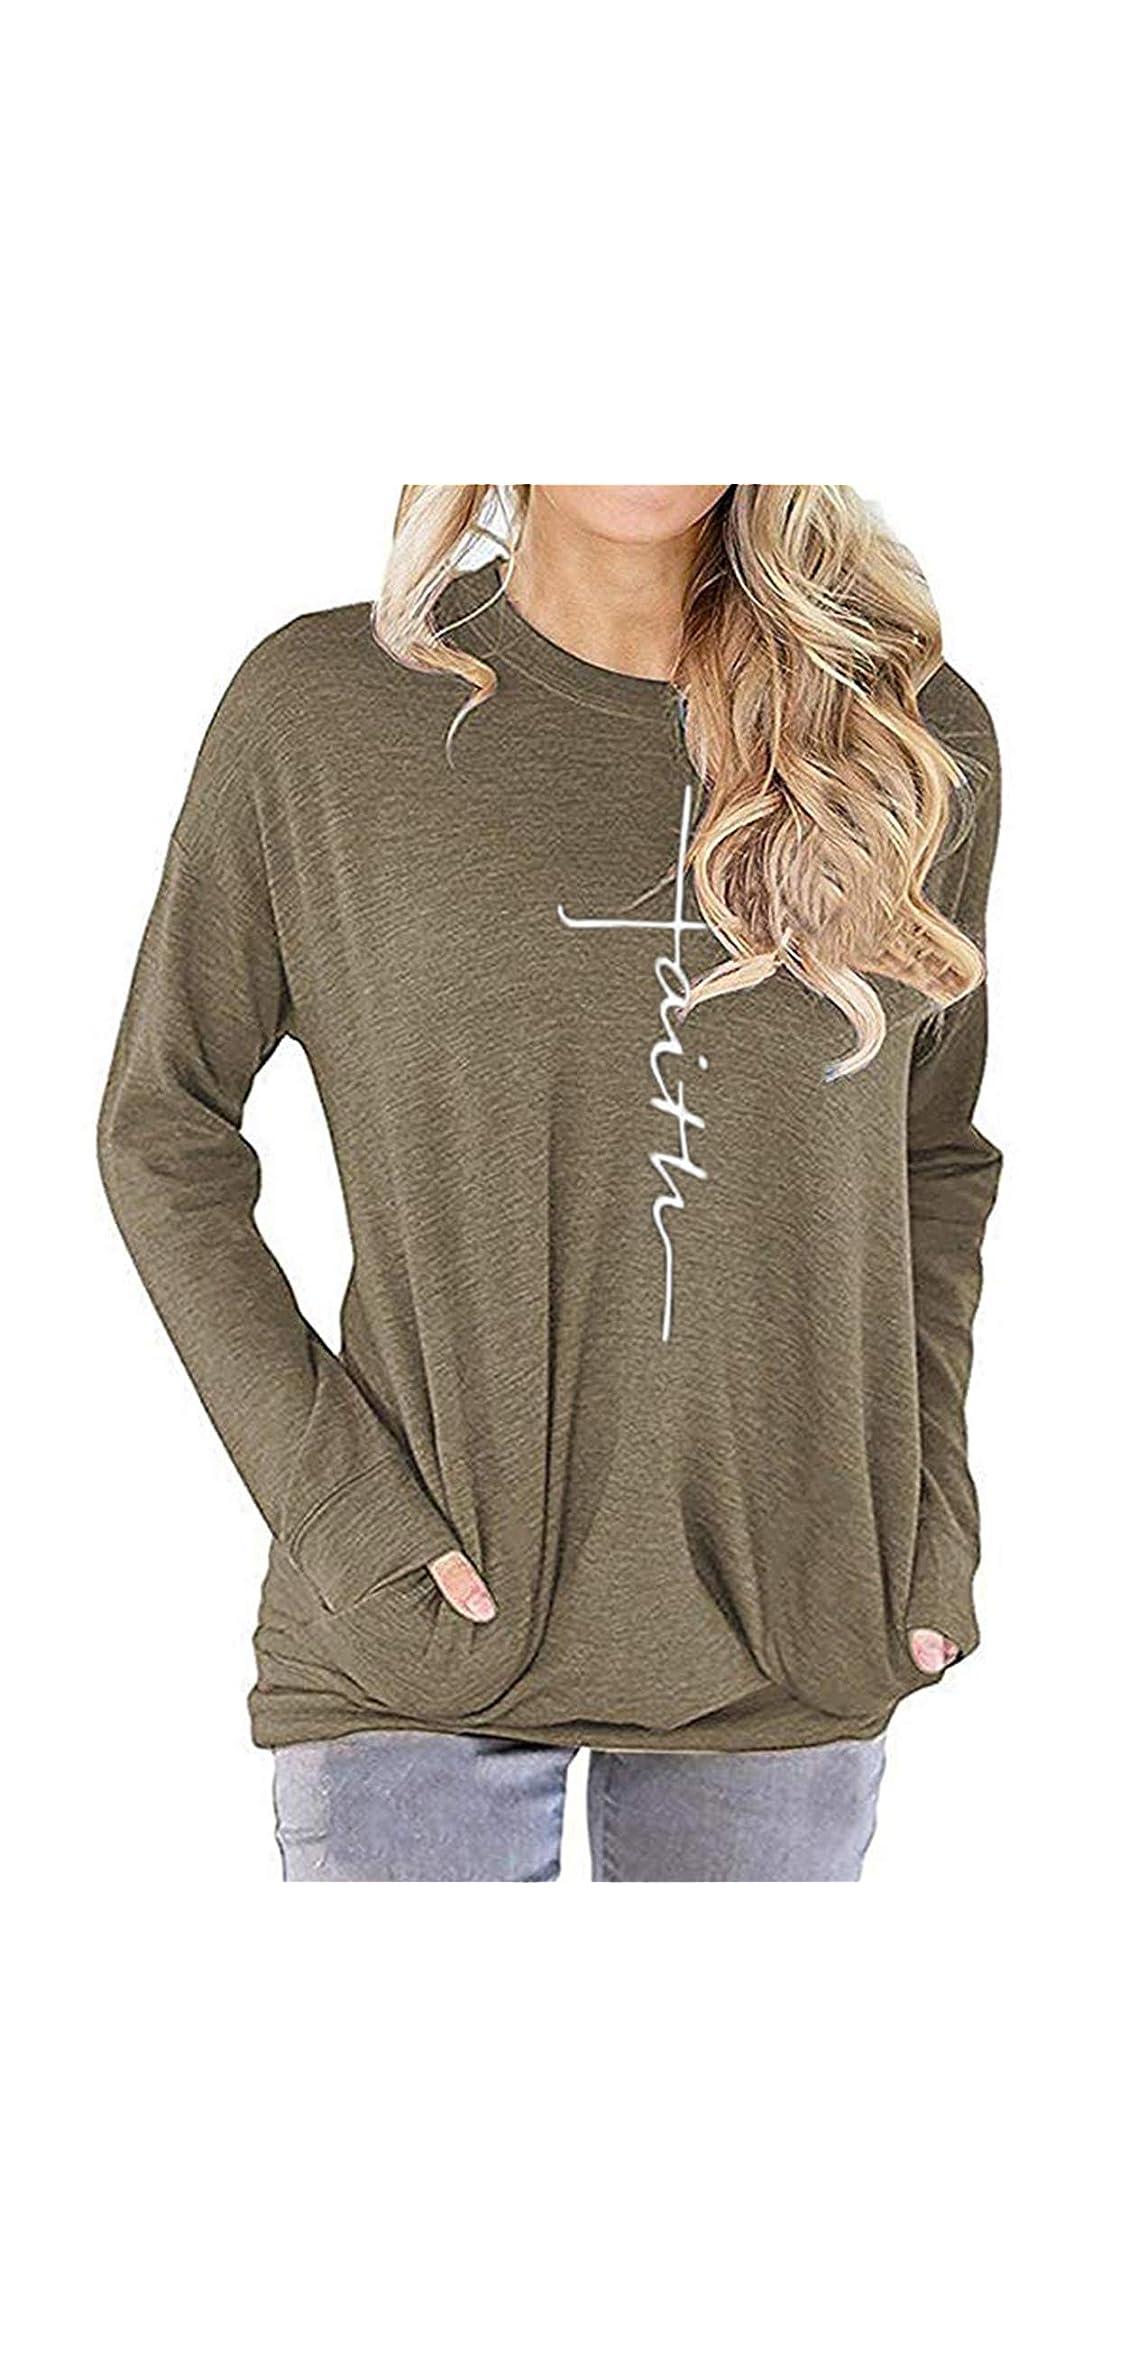 Women's Casual Letter Print Crewneck T-shirt Long Sleeve